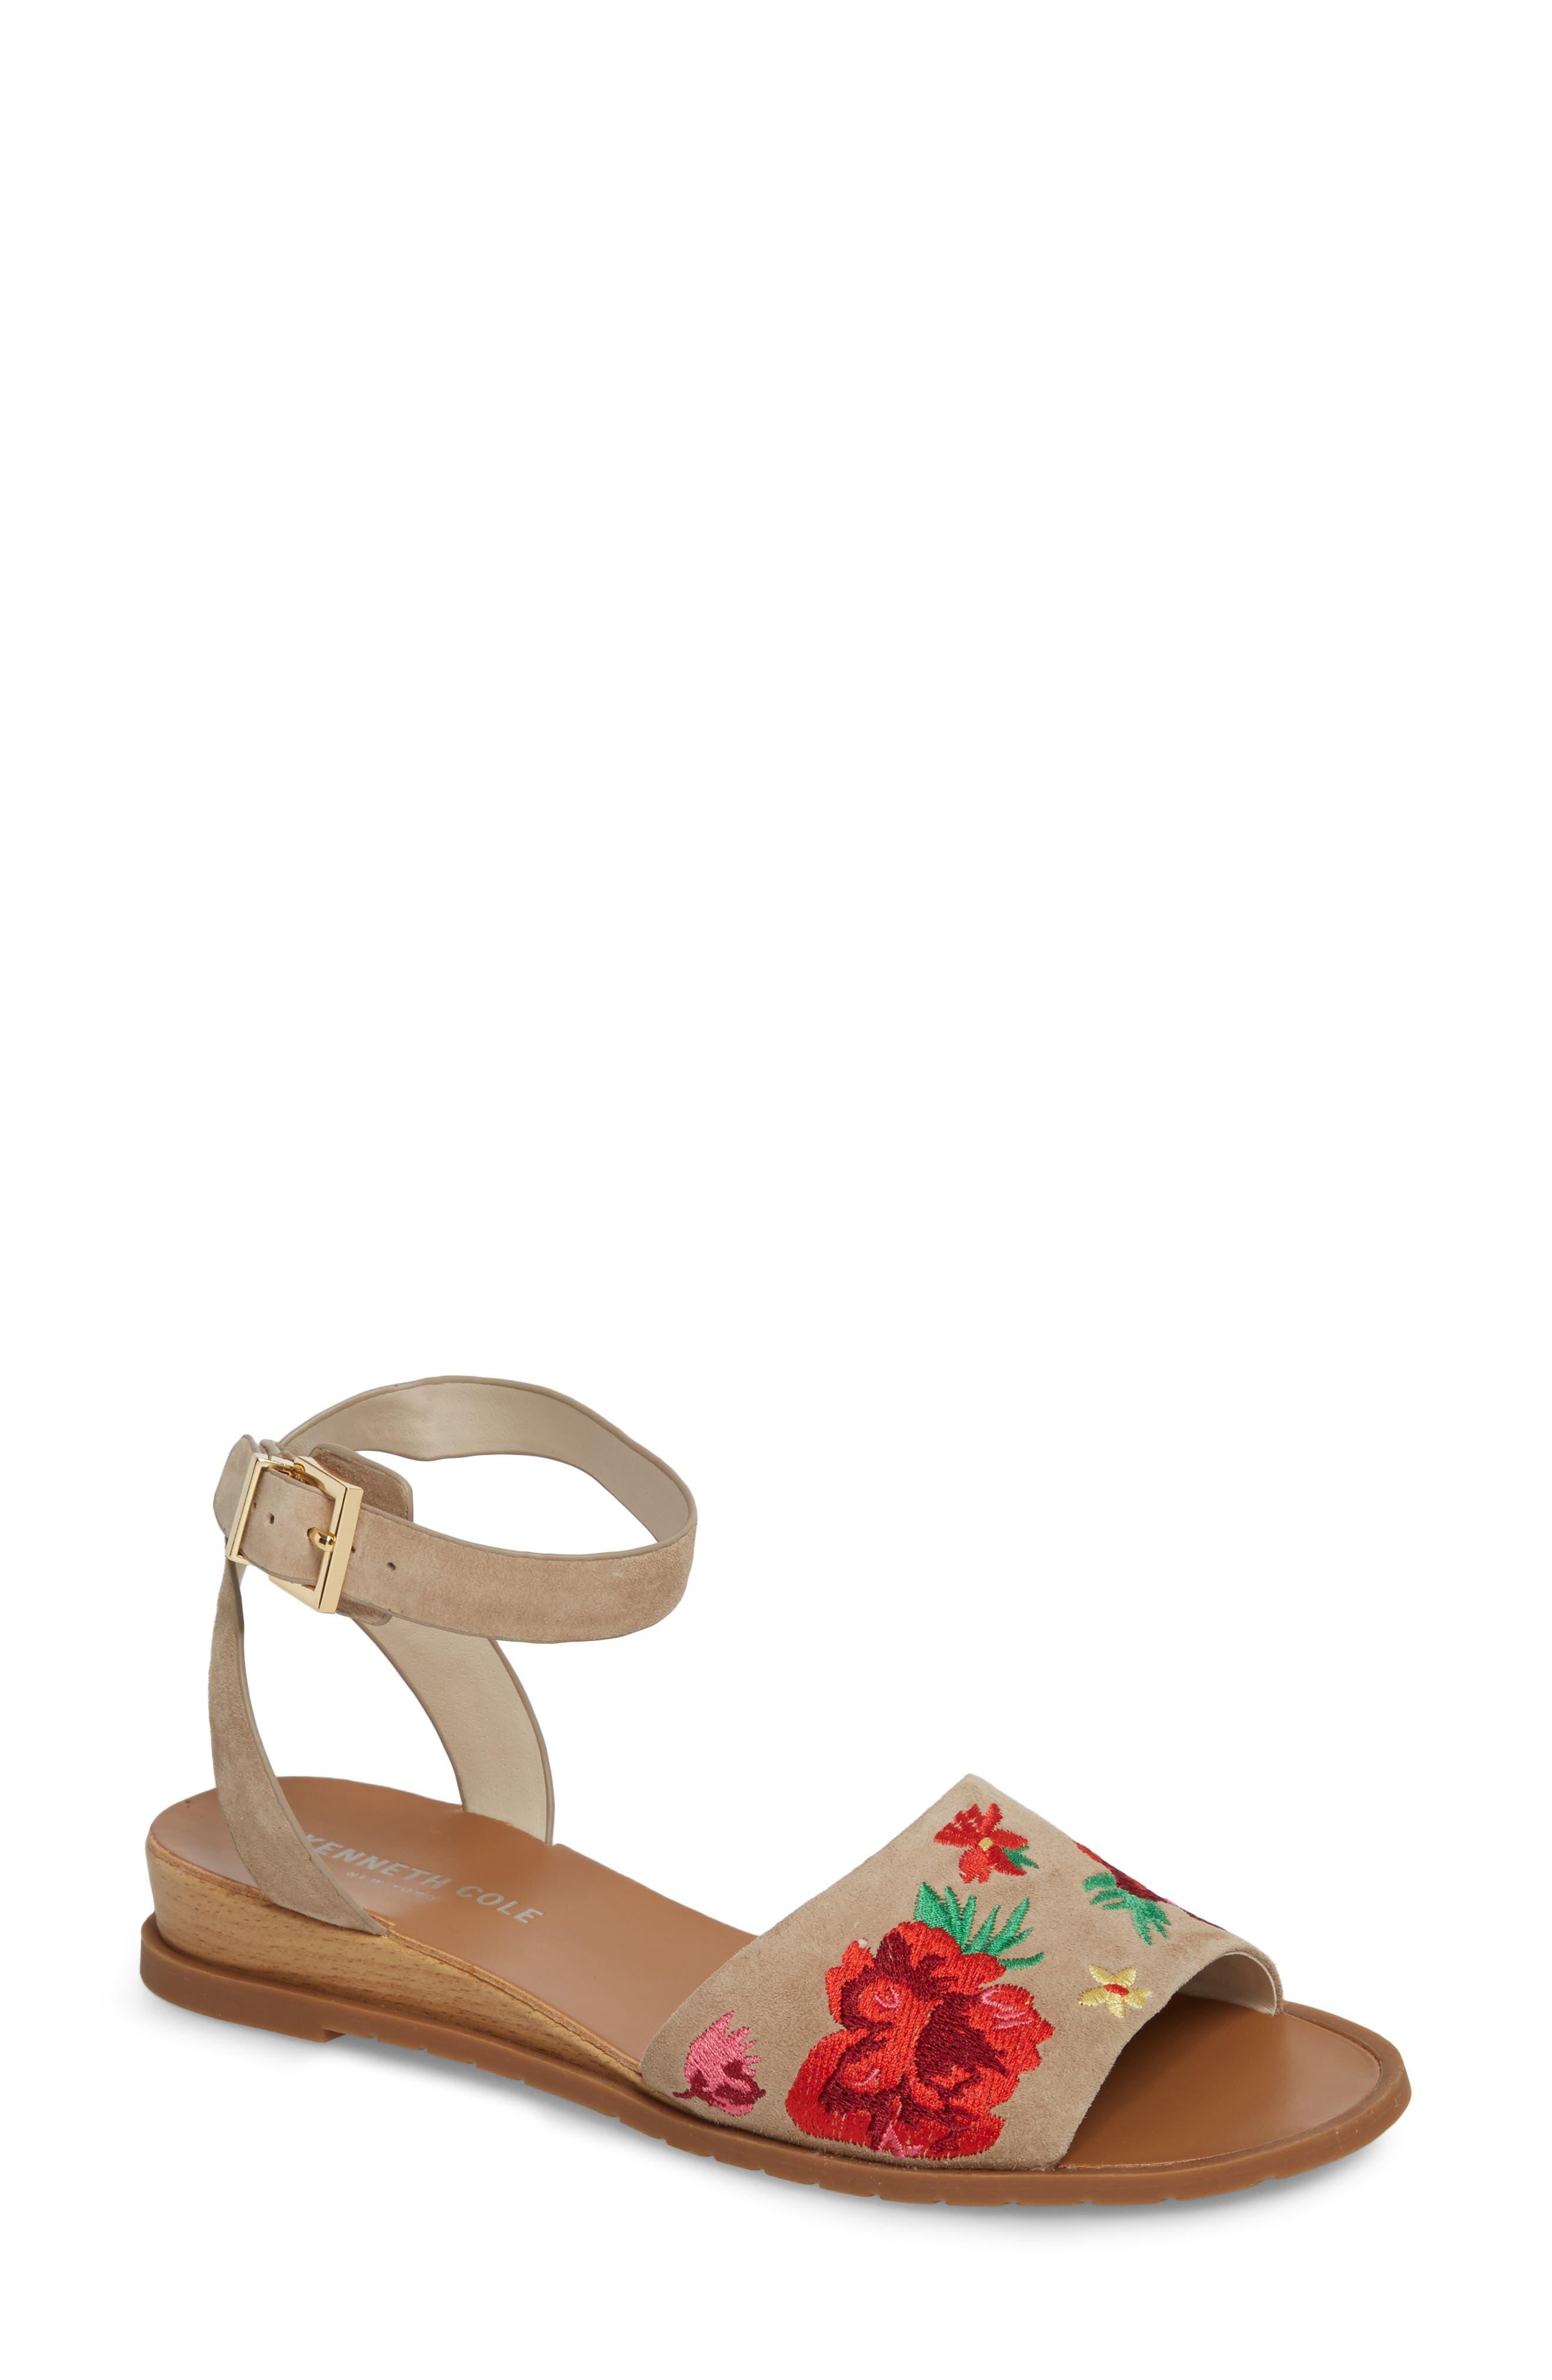 Jinny Ankle Strap Sandal,                         Main,                         color, 250